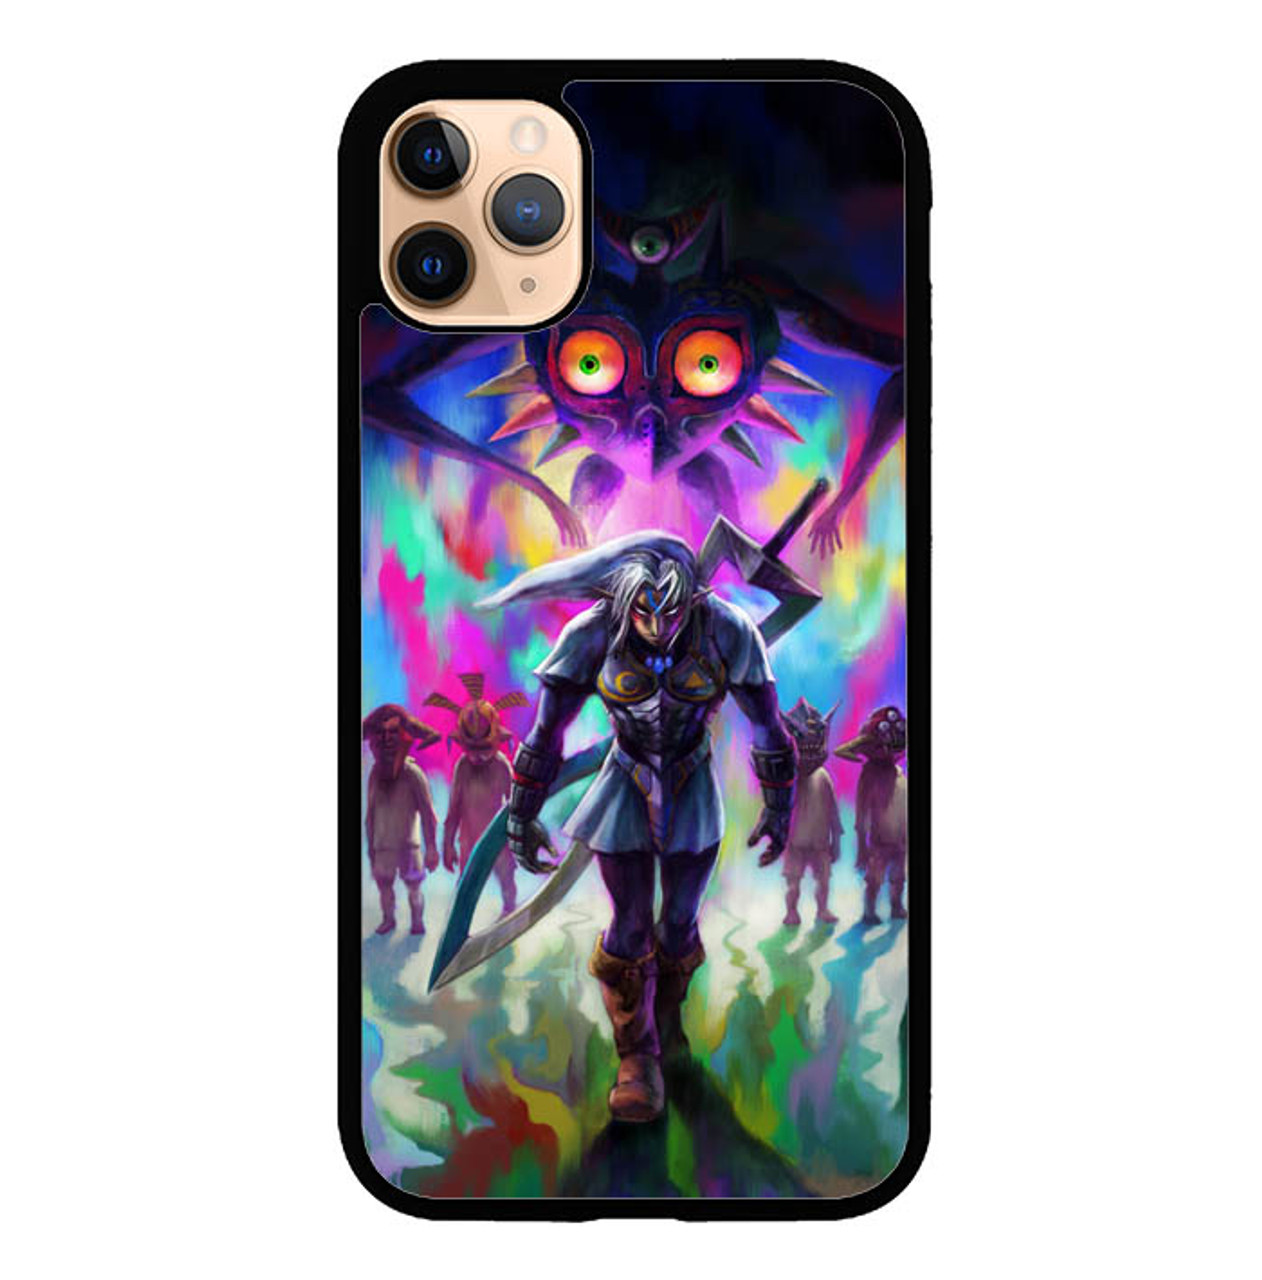 Majoras Mask iPhone 11 case